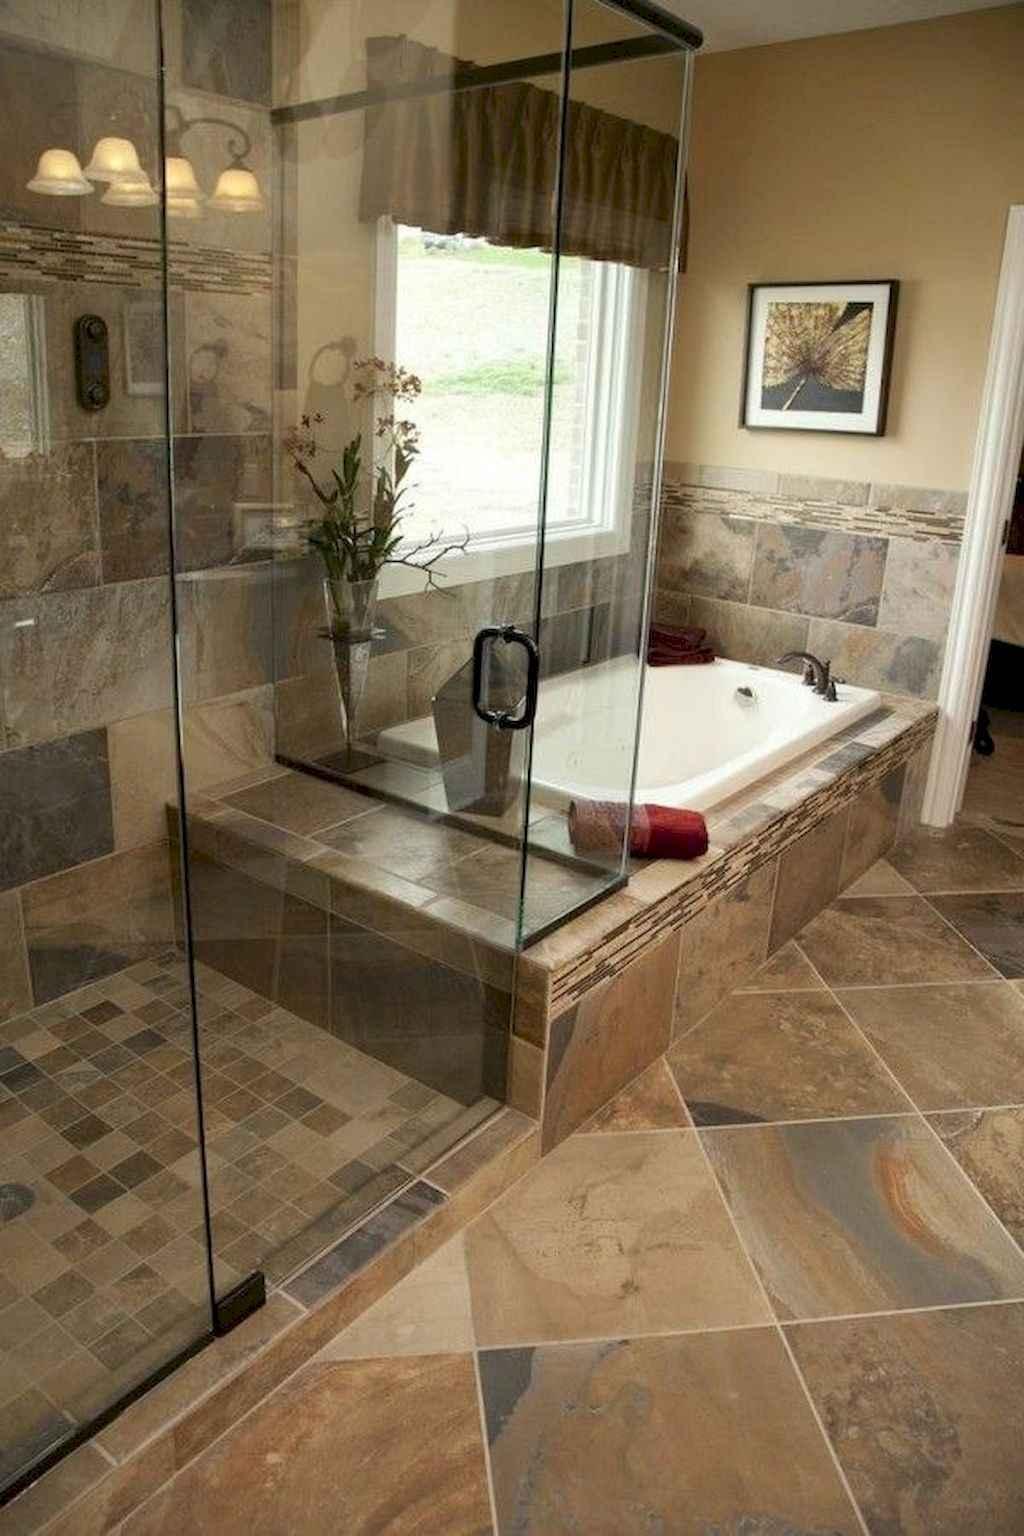 111 Brilliant Small Bathroom Remodel Ideas On A Budget (39)